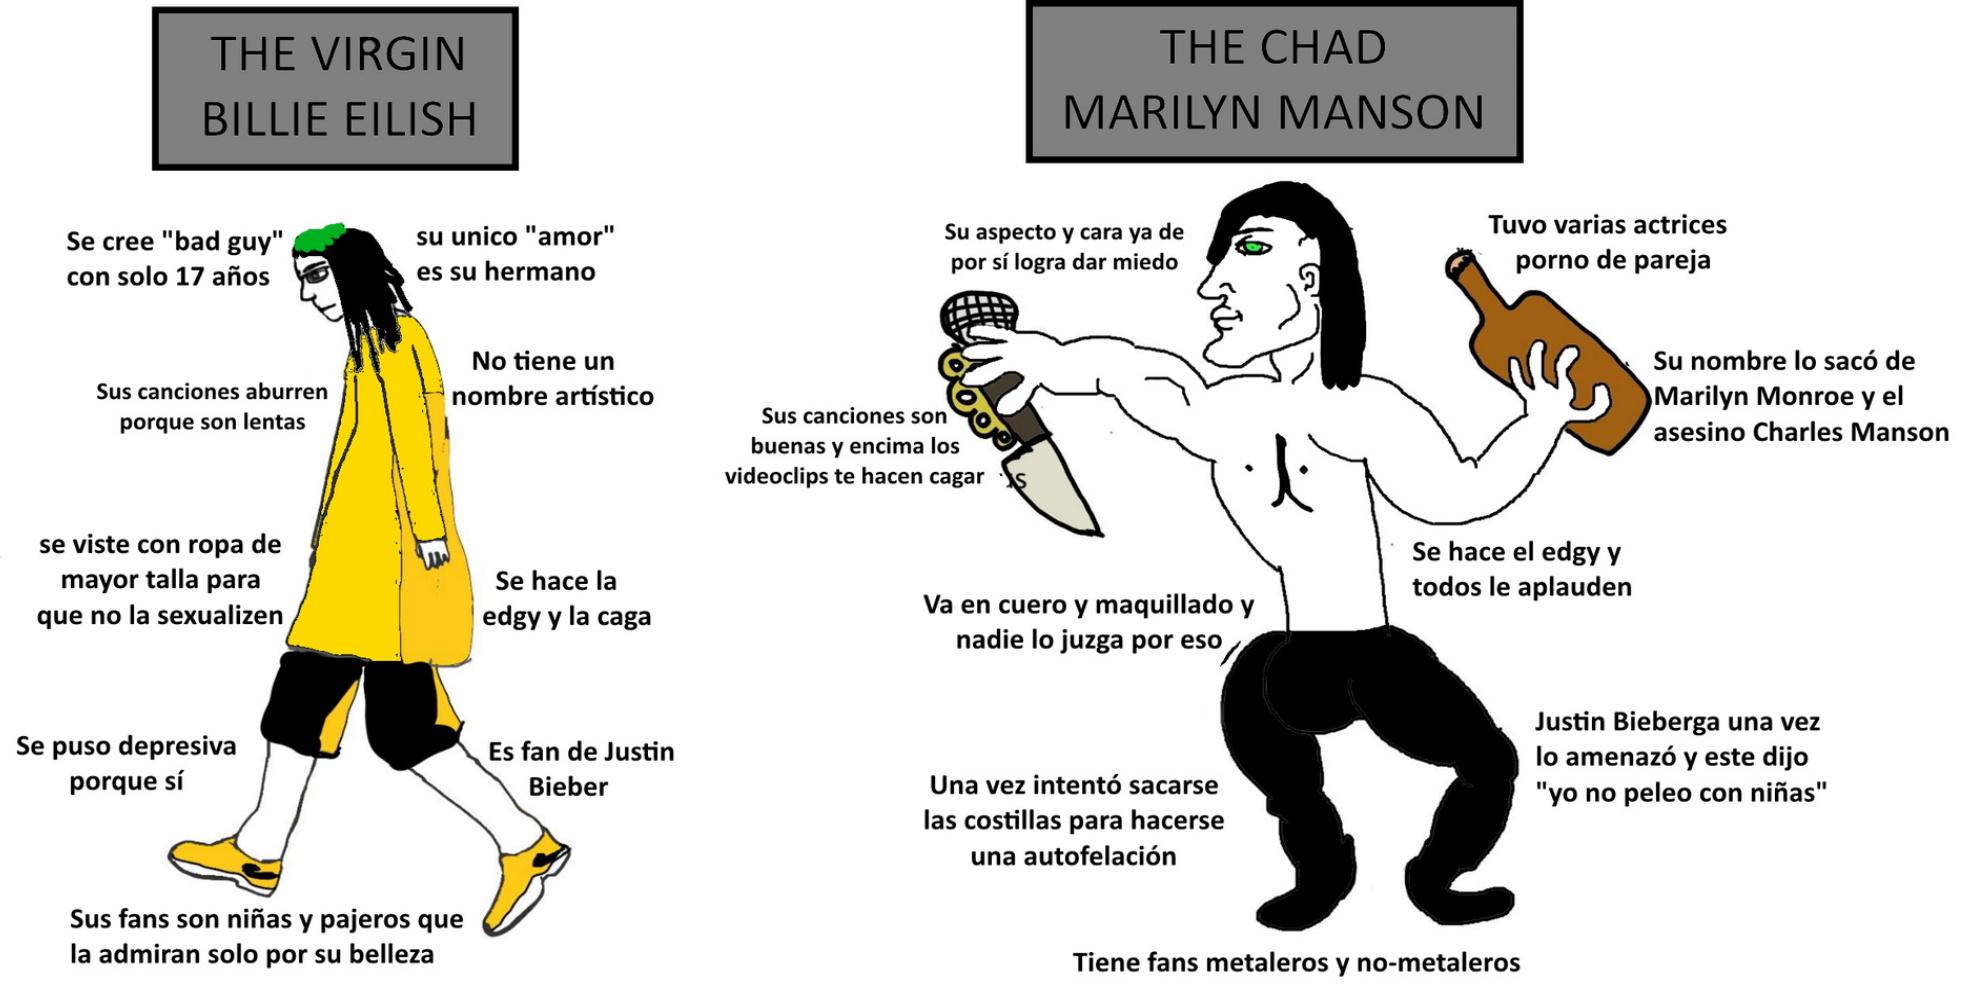 Billie Eilish vs Marilyn Manson - meme